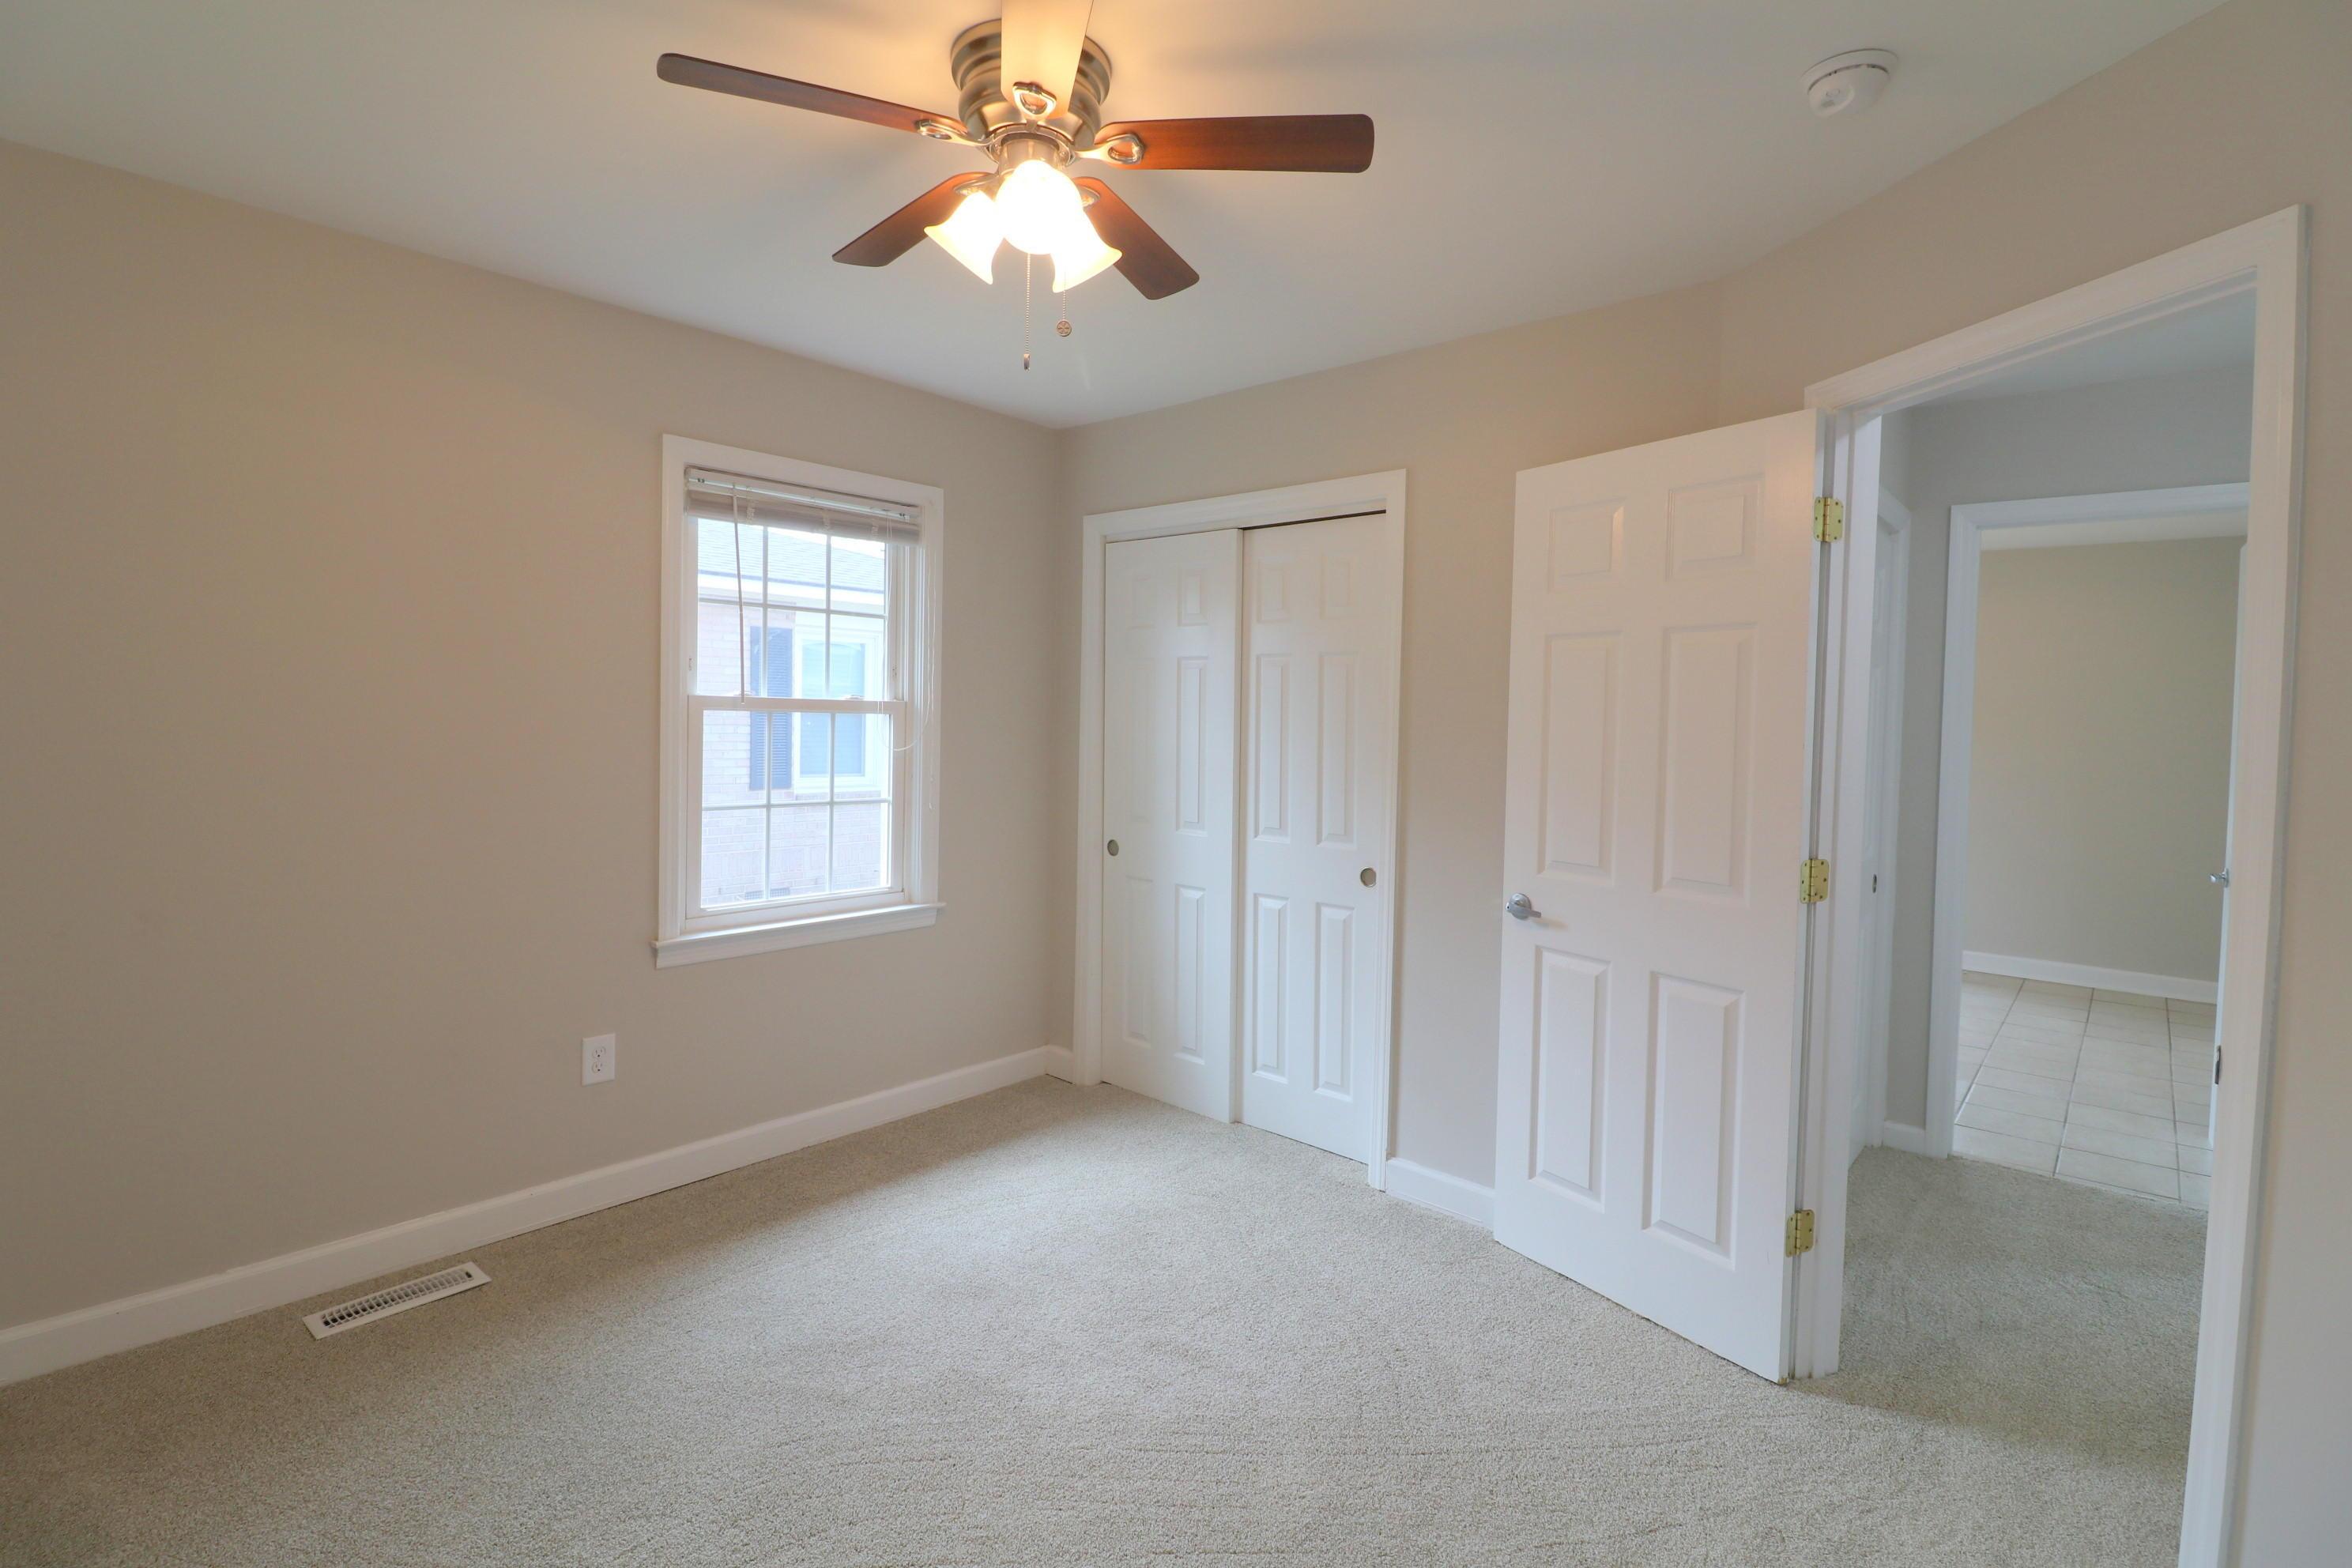 Park Circle Homes For Sale - 5274 Potomac, North Charleston, SC - 5